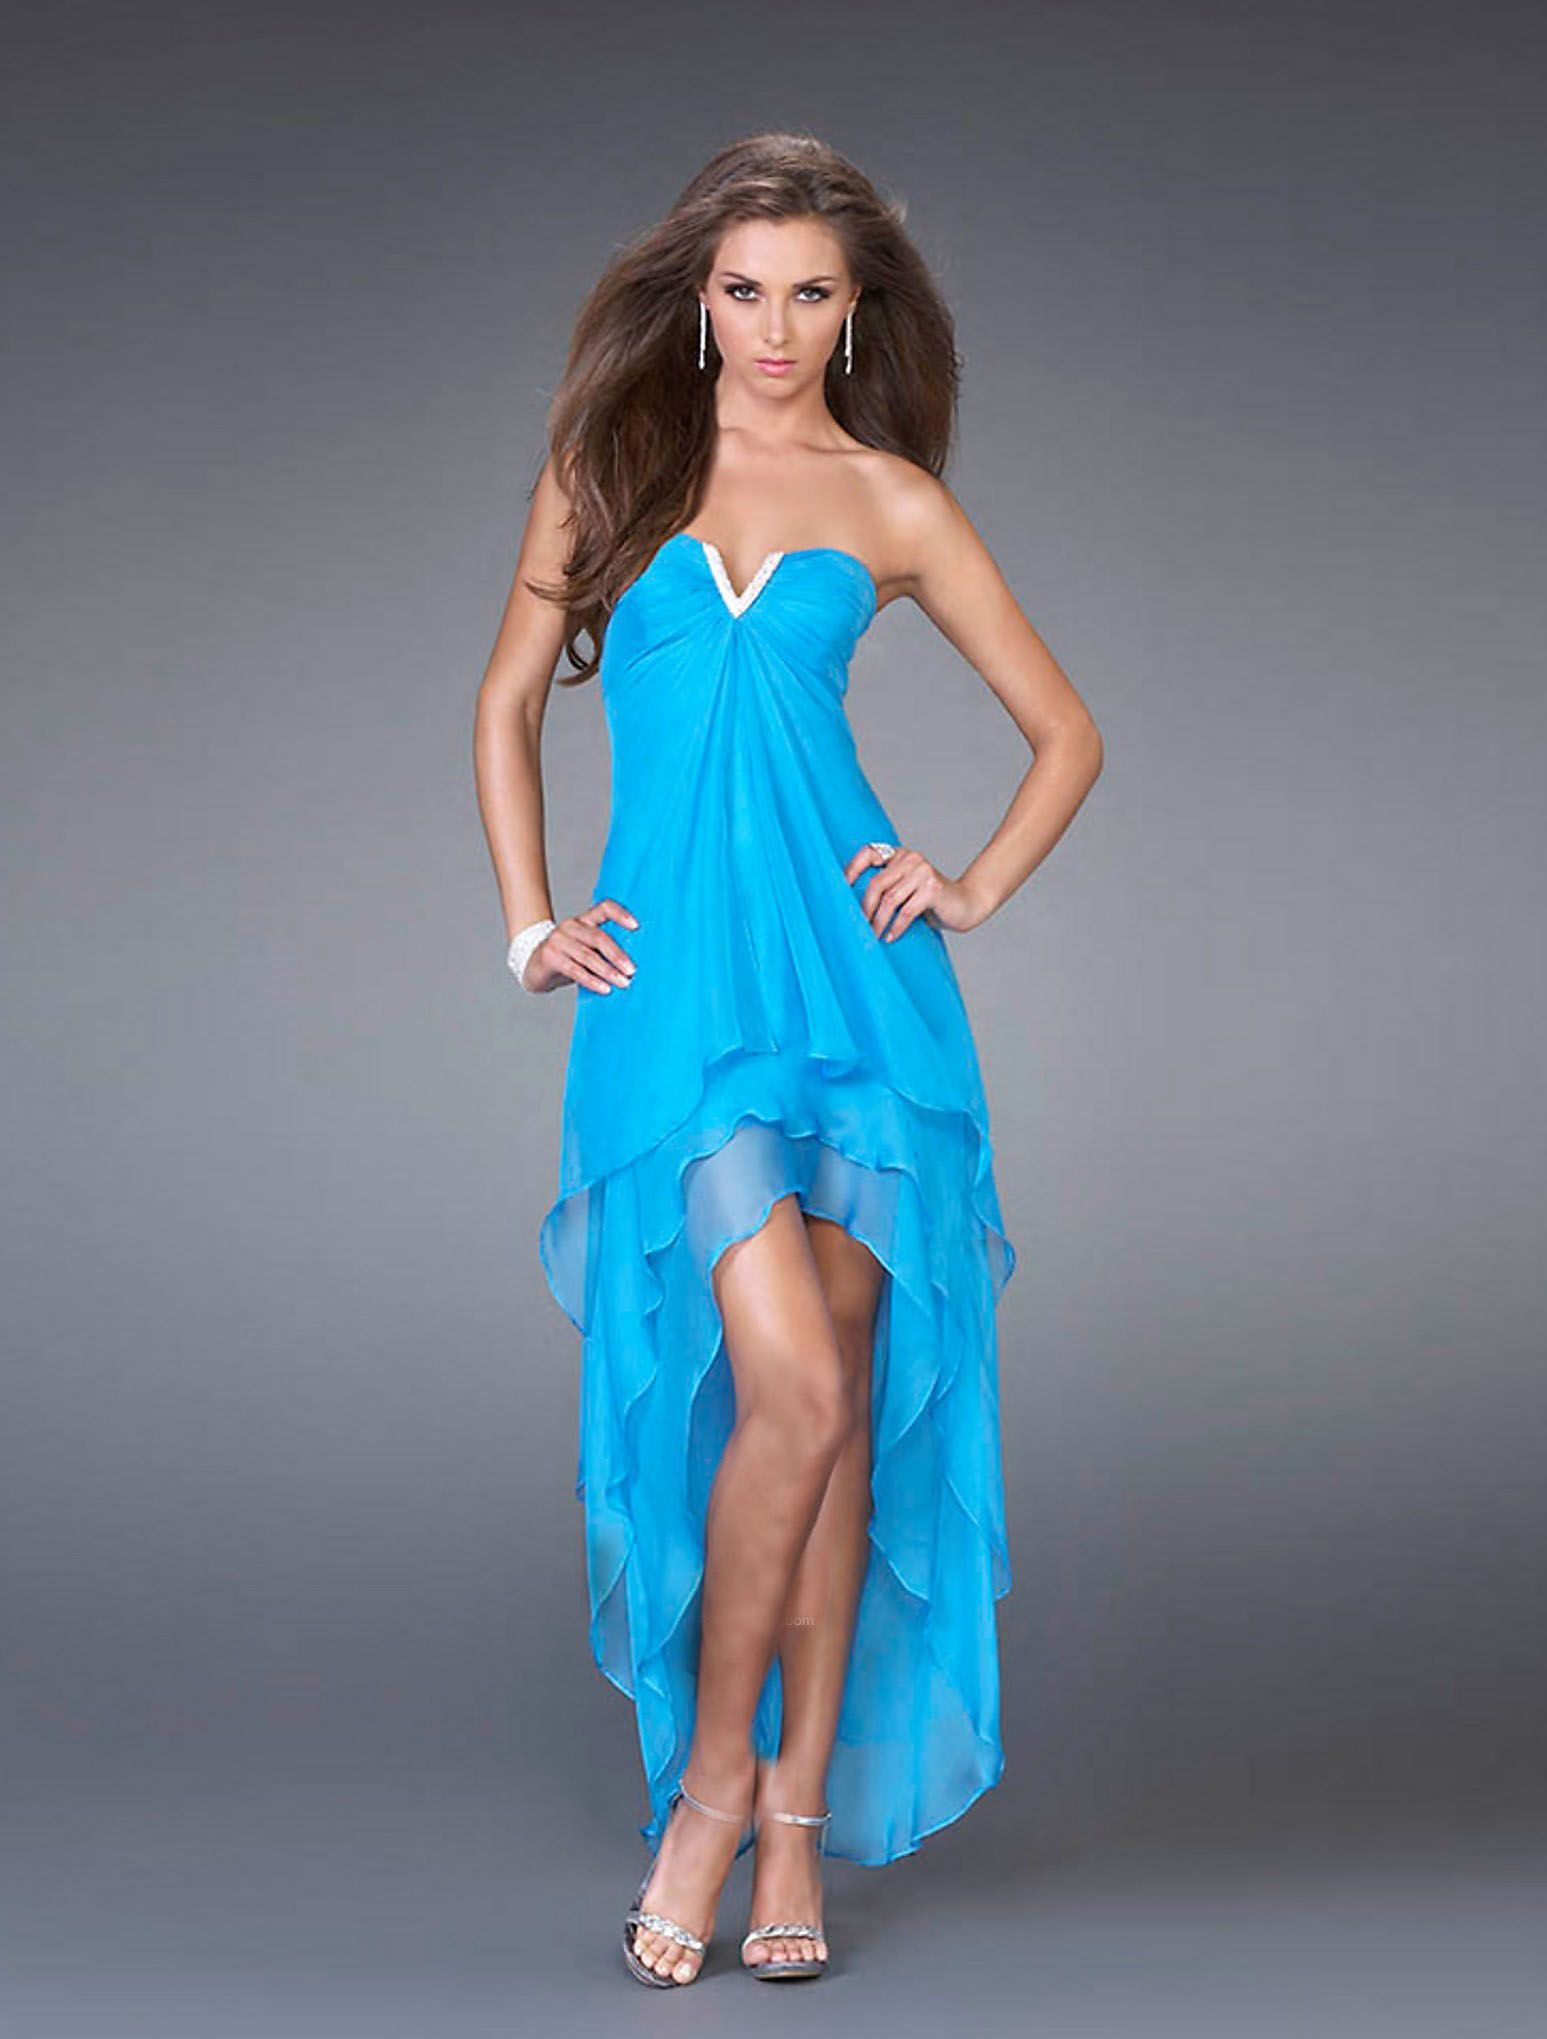 high low prom dress   Gorgeous dress   Pinterest   Stunning prom ...